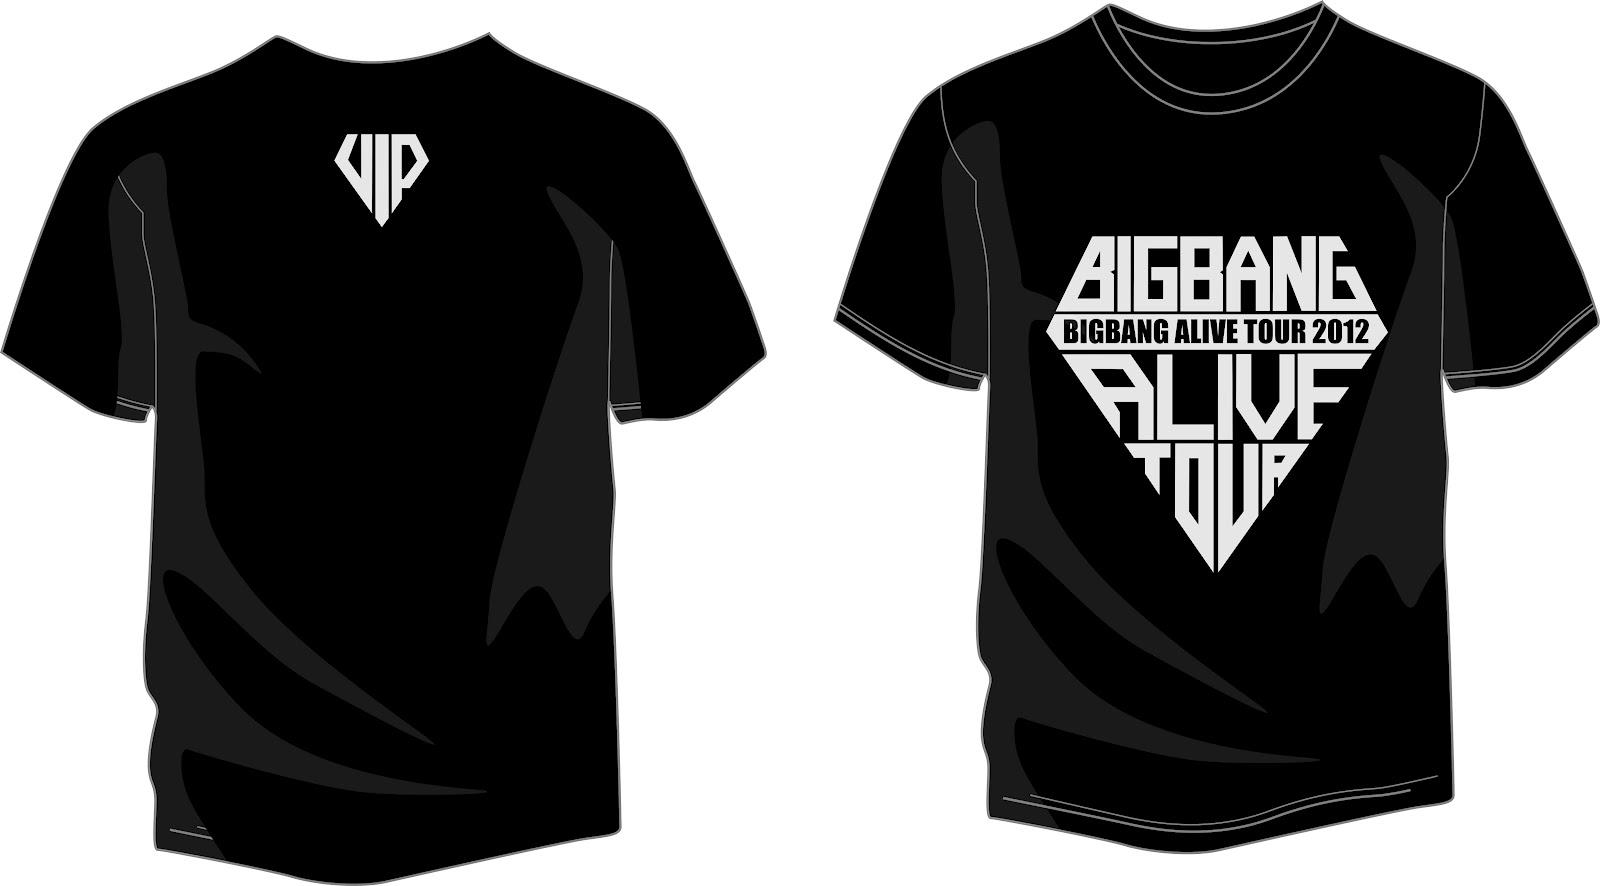 Desain t shirt jkt48 -  Desain T Shirt Bigbang Infinite Vixx